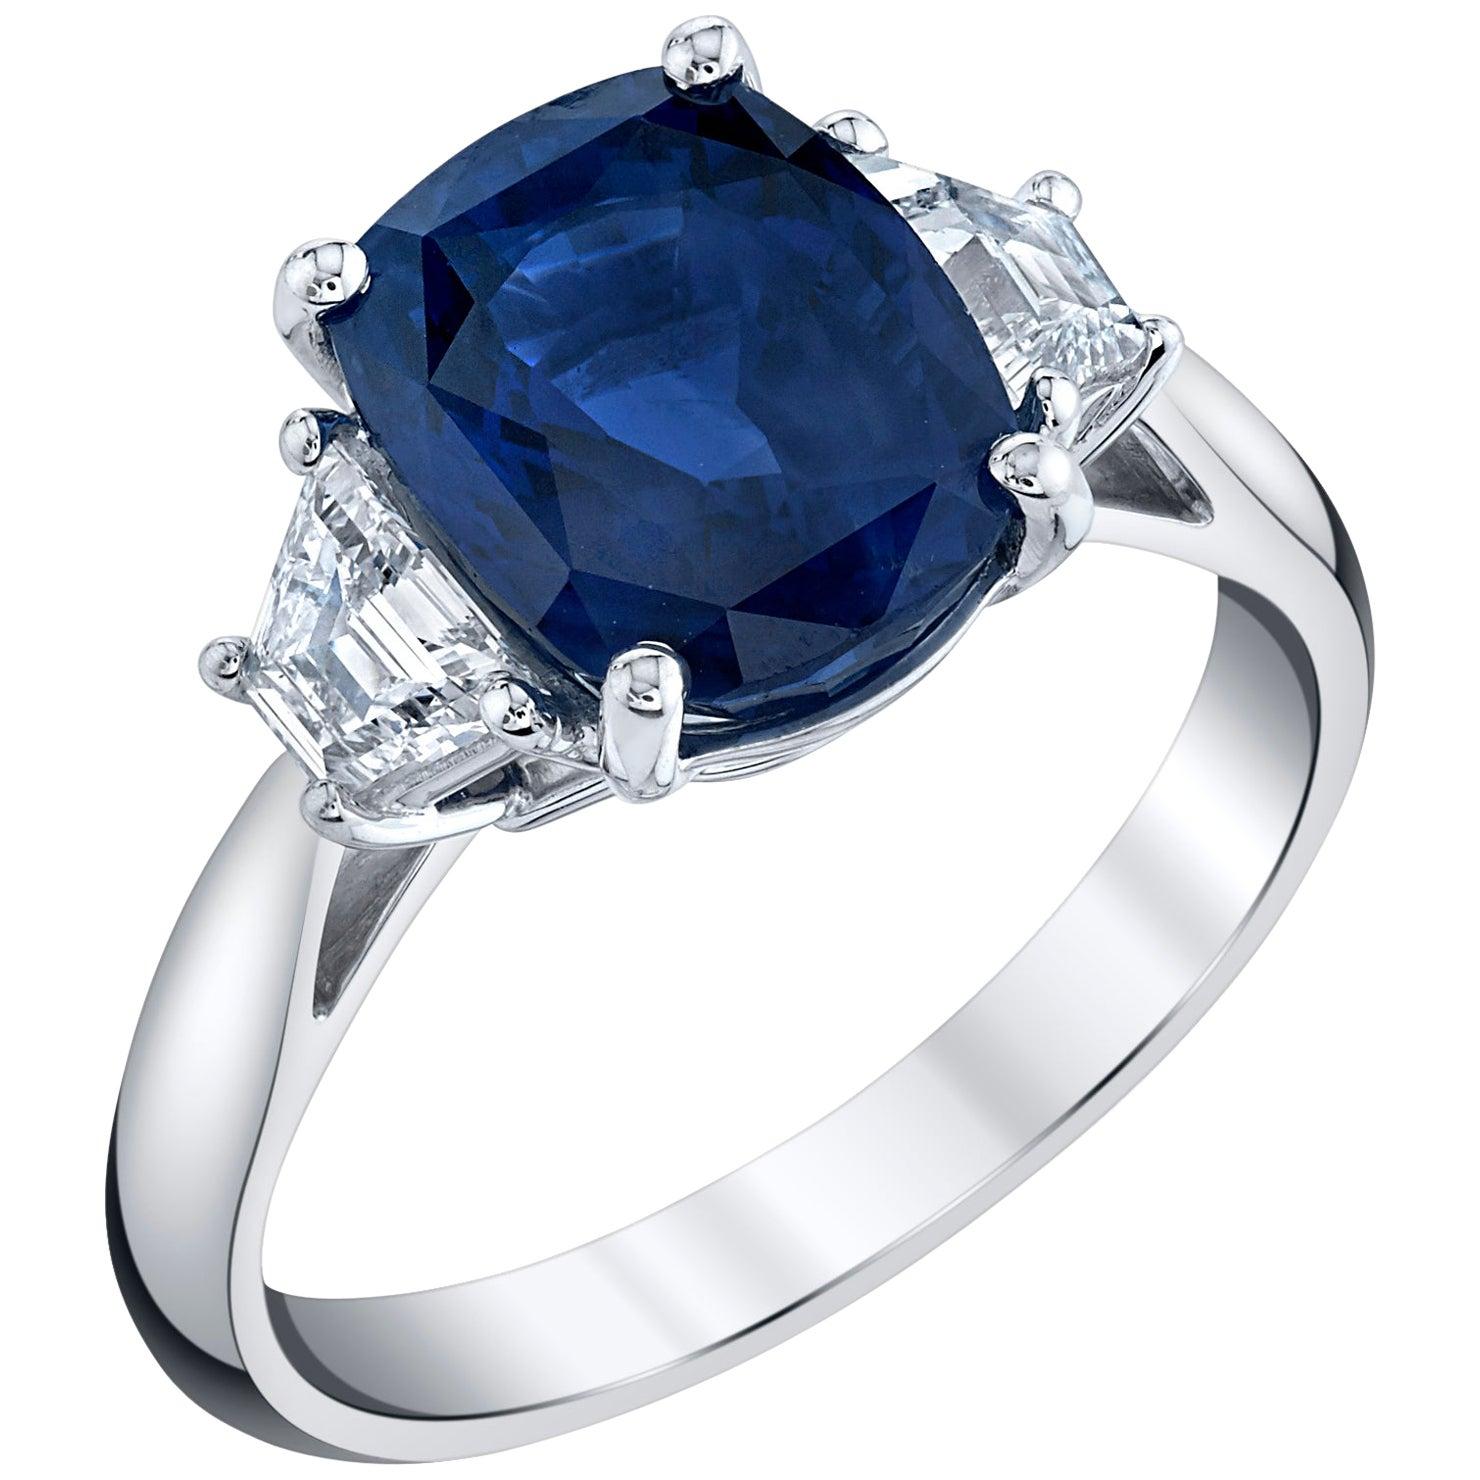 4.05 ct. Unheated Blue Sapphire GIA, Diamond, Platinum 3-Stone Engagement Ring